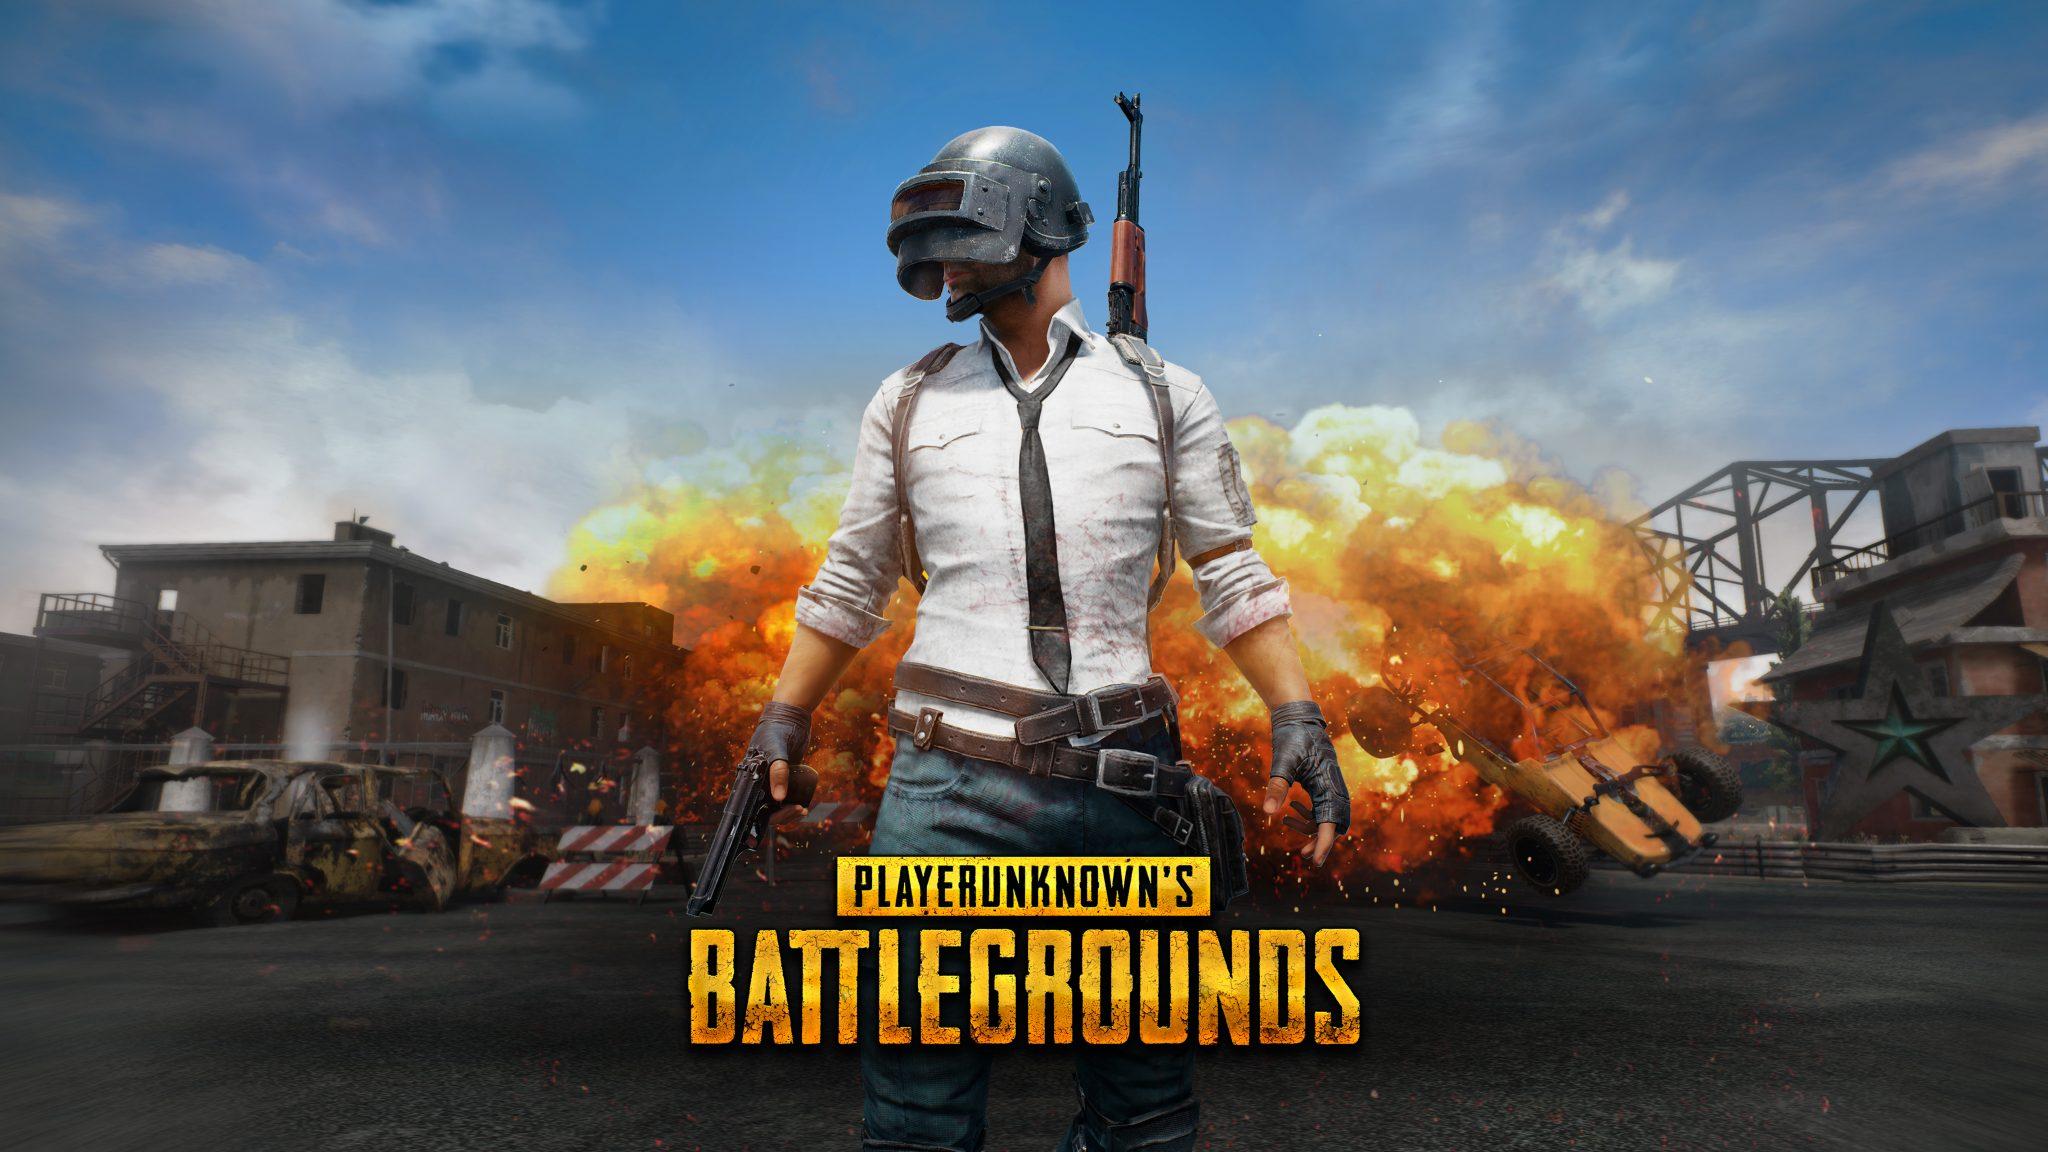 2560x1080 Playerunknowns Battlegrounds 2017 Game 2560x1080: Playerunknowns Battlegrounds Cover PUBG 5K Wallpaper